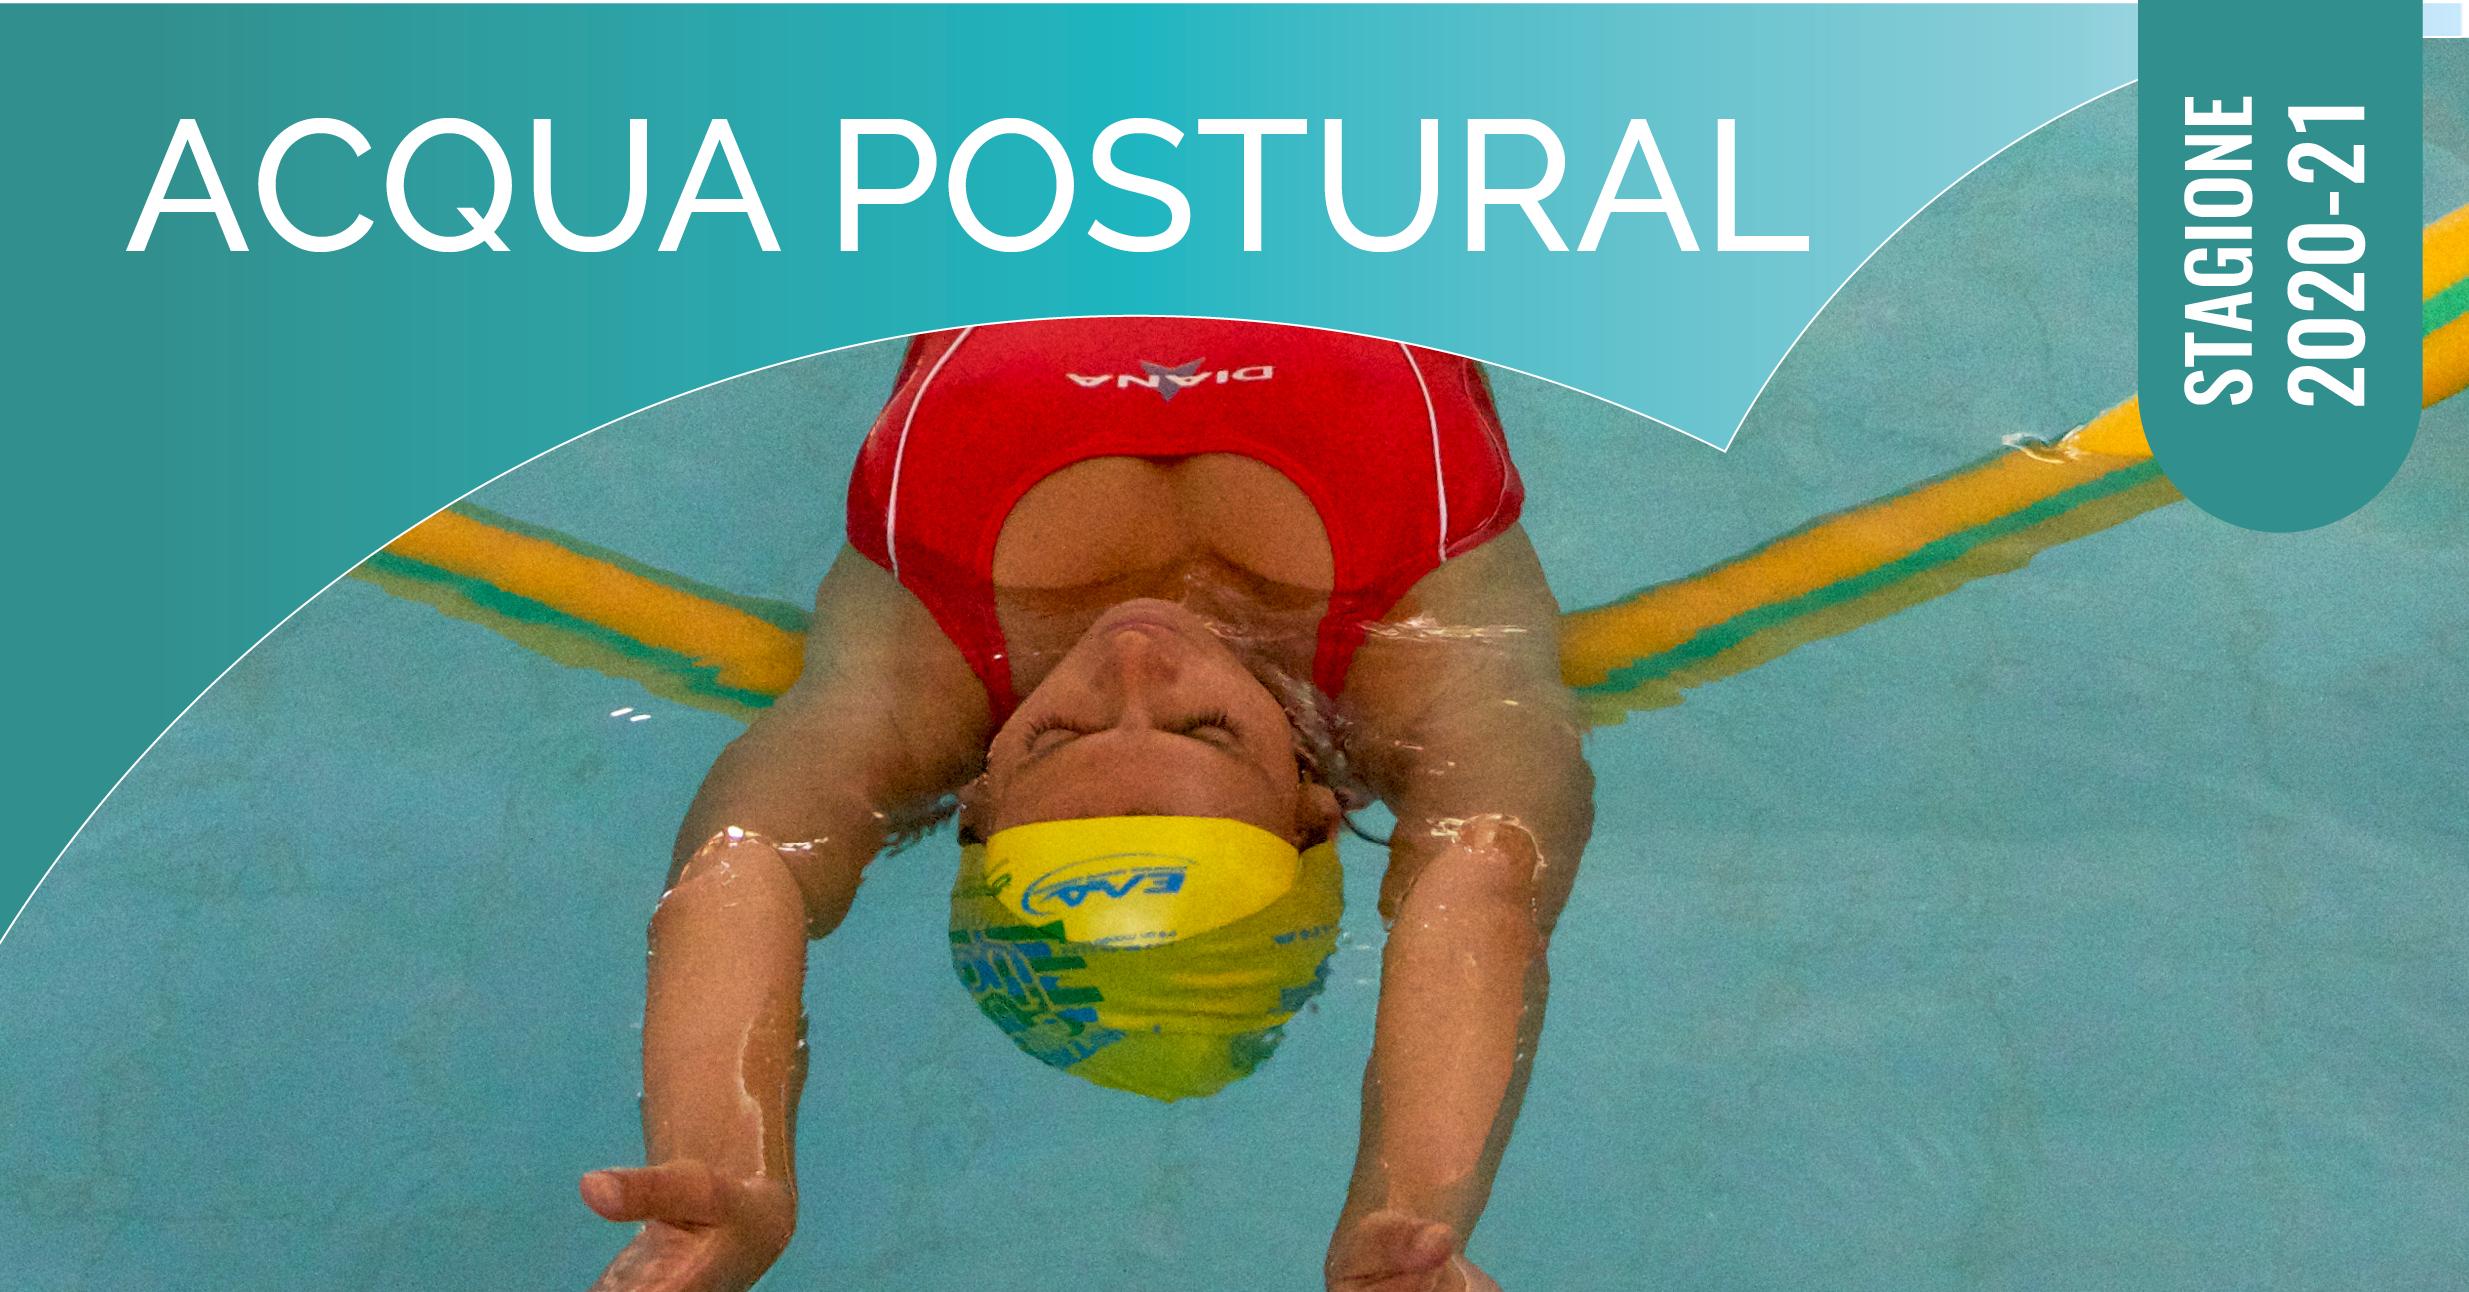 acqua-postural